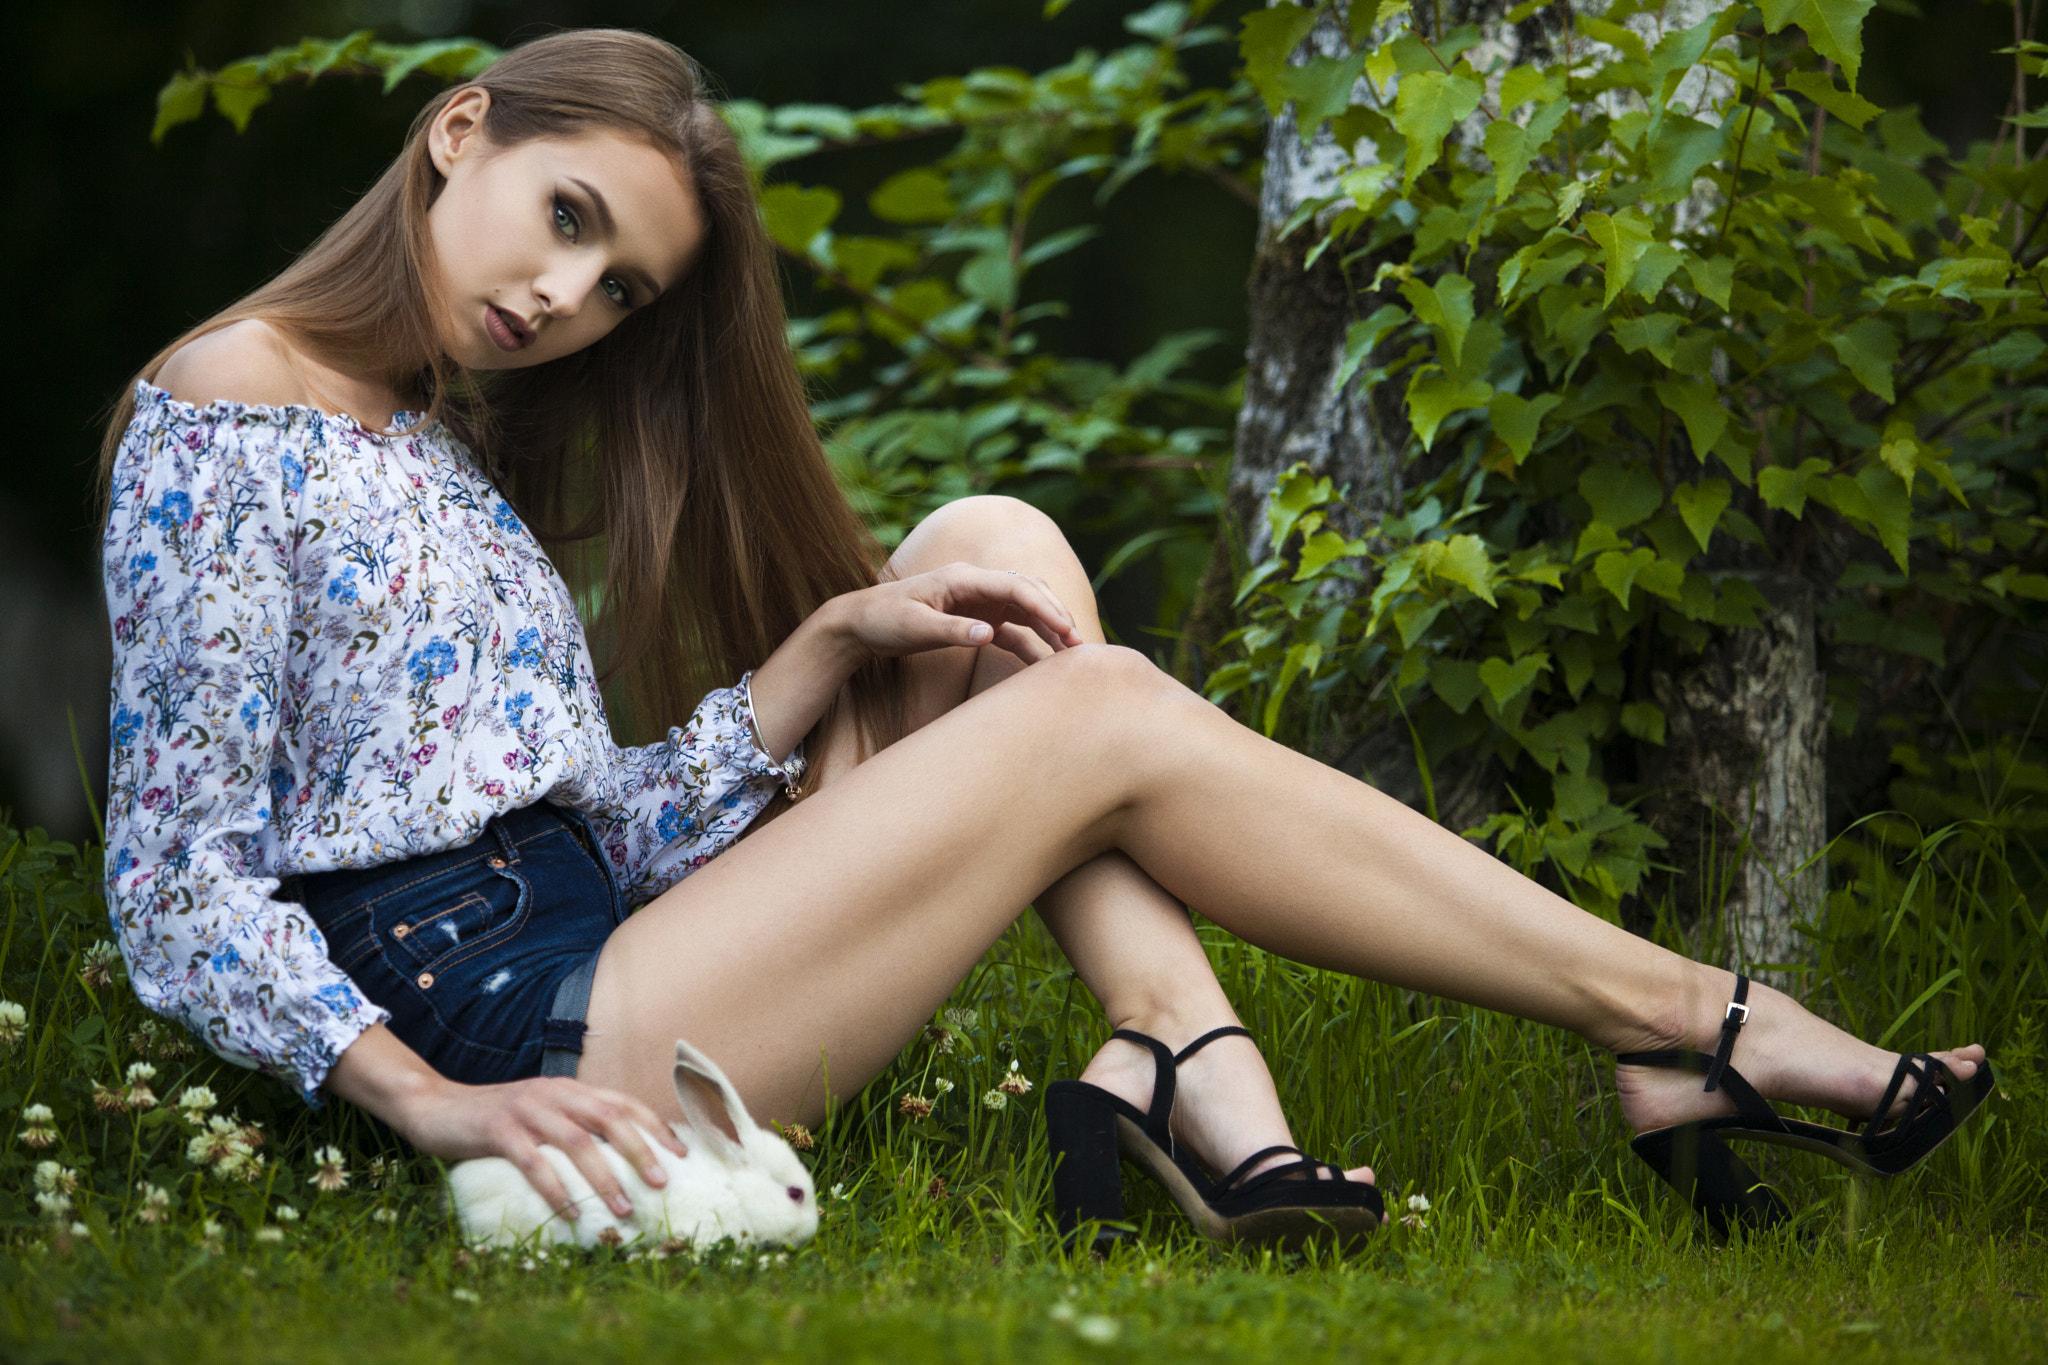 People 2048x1365 women sitting jean shorts rabbits high heels brunette grass portrait women outdoors